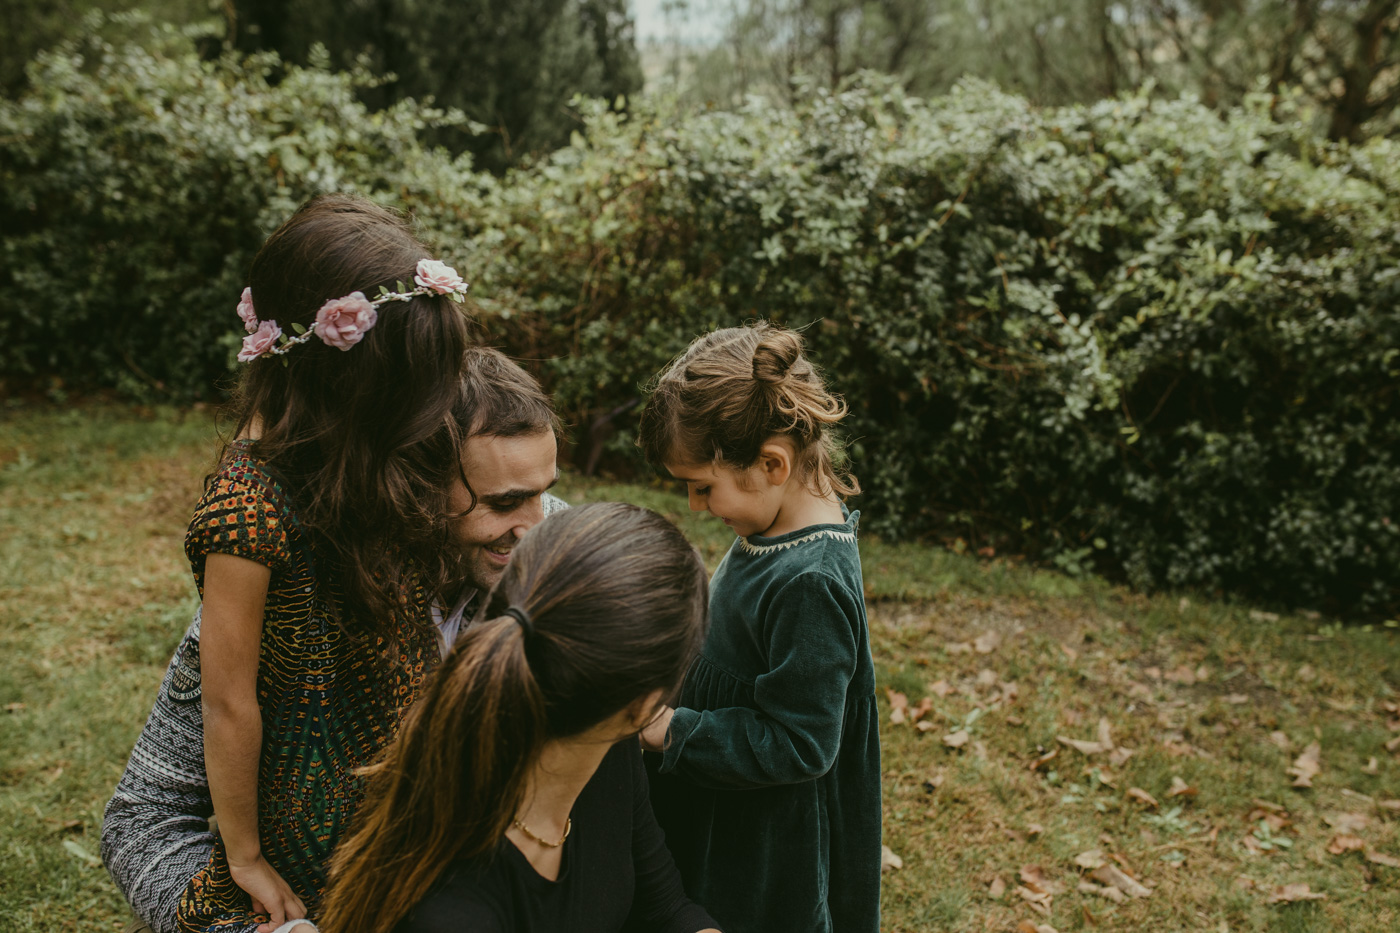 Velvet-Hush-fotografos-sesion-familia-066